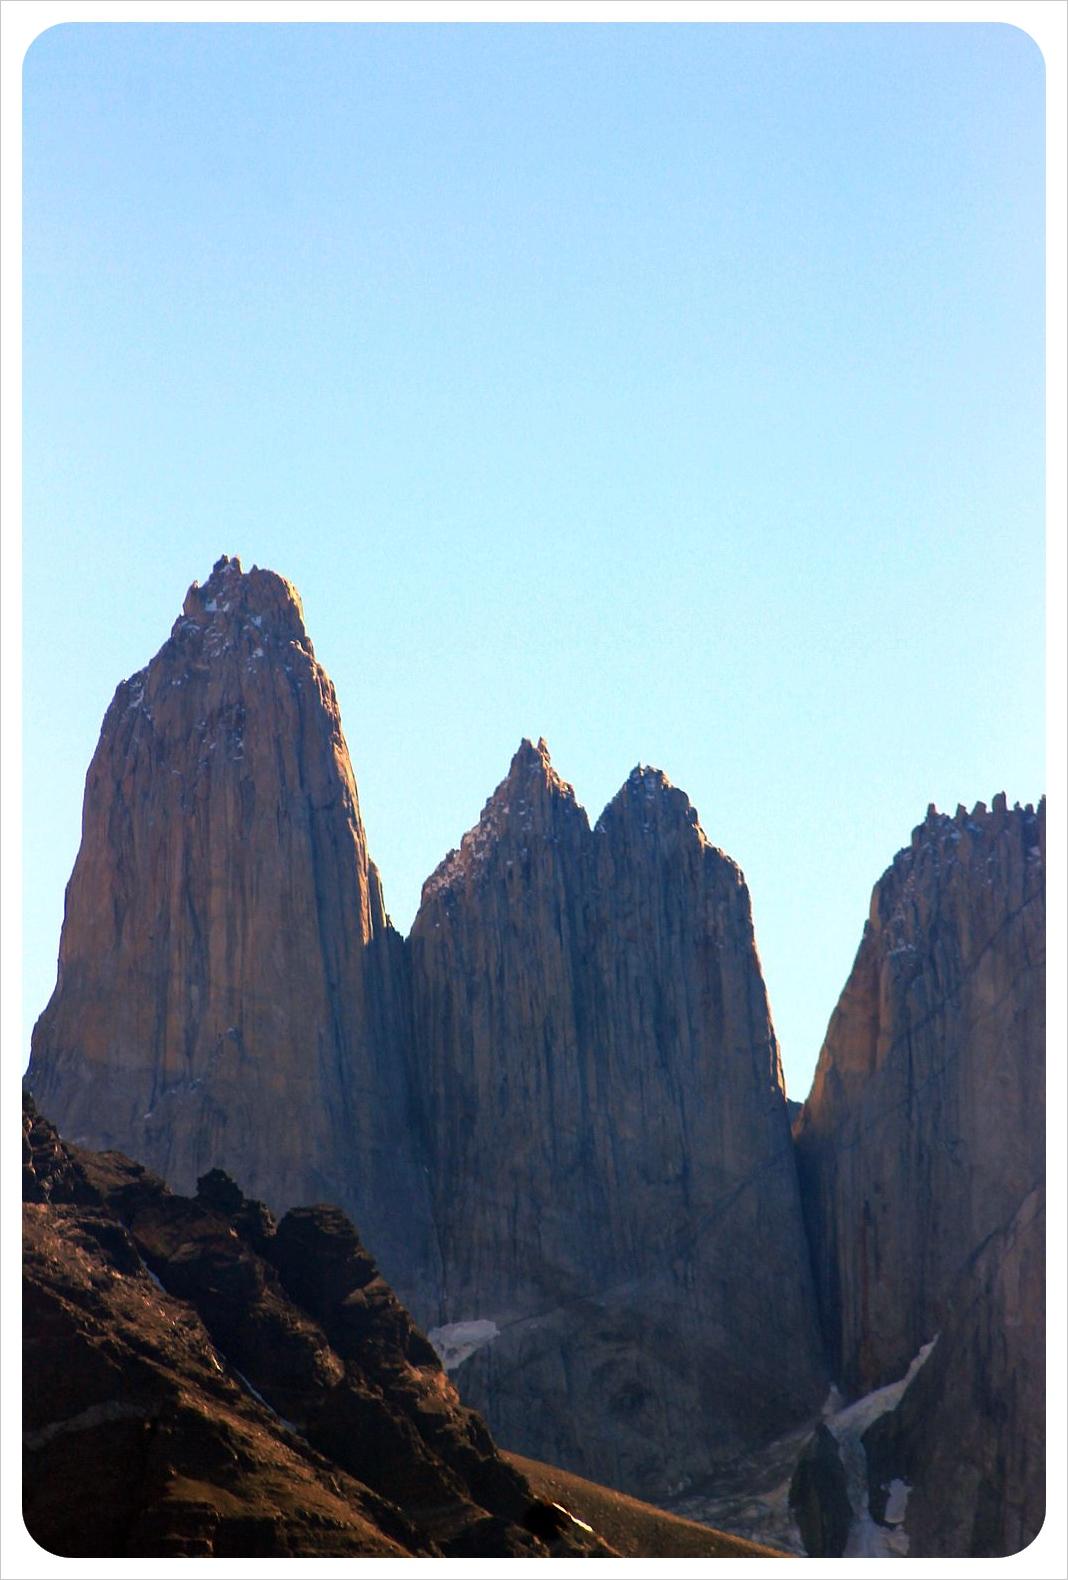 torres del paine national park torres